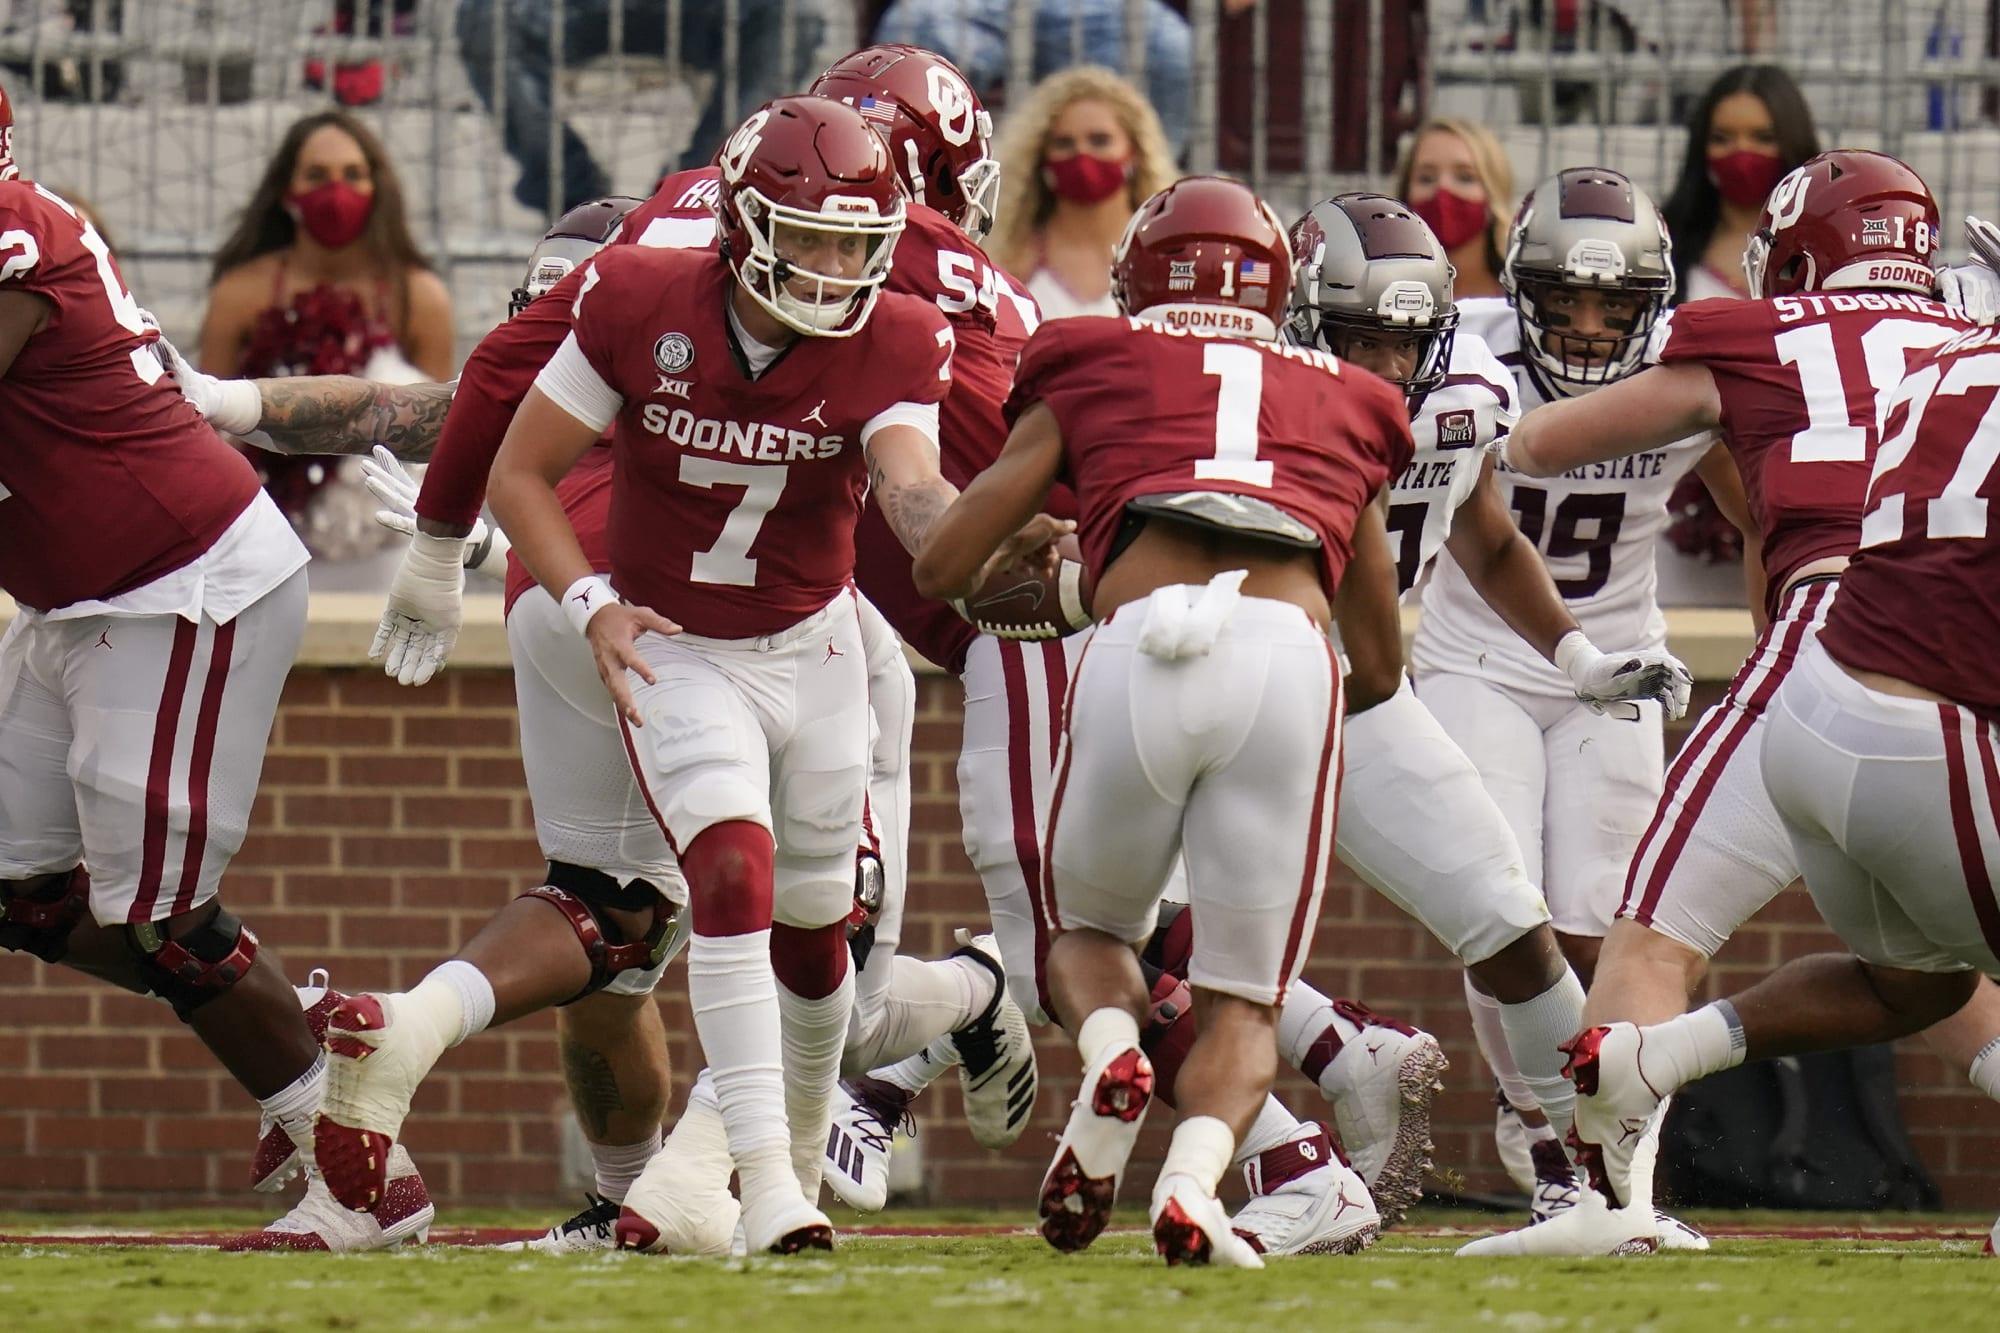 Oklahoma Football: 3 takeaways from shocking upset loss to Kansas State